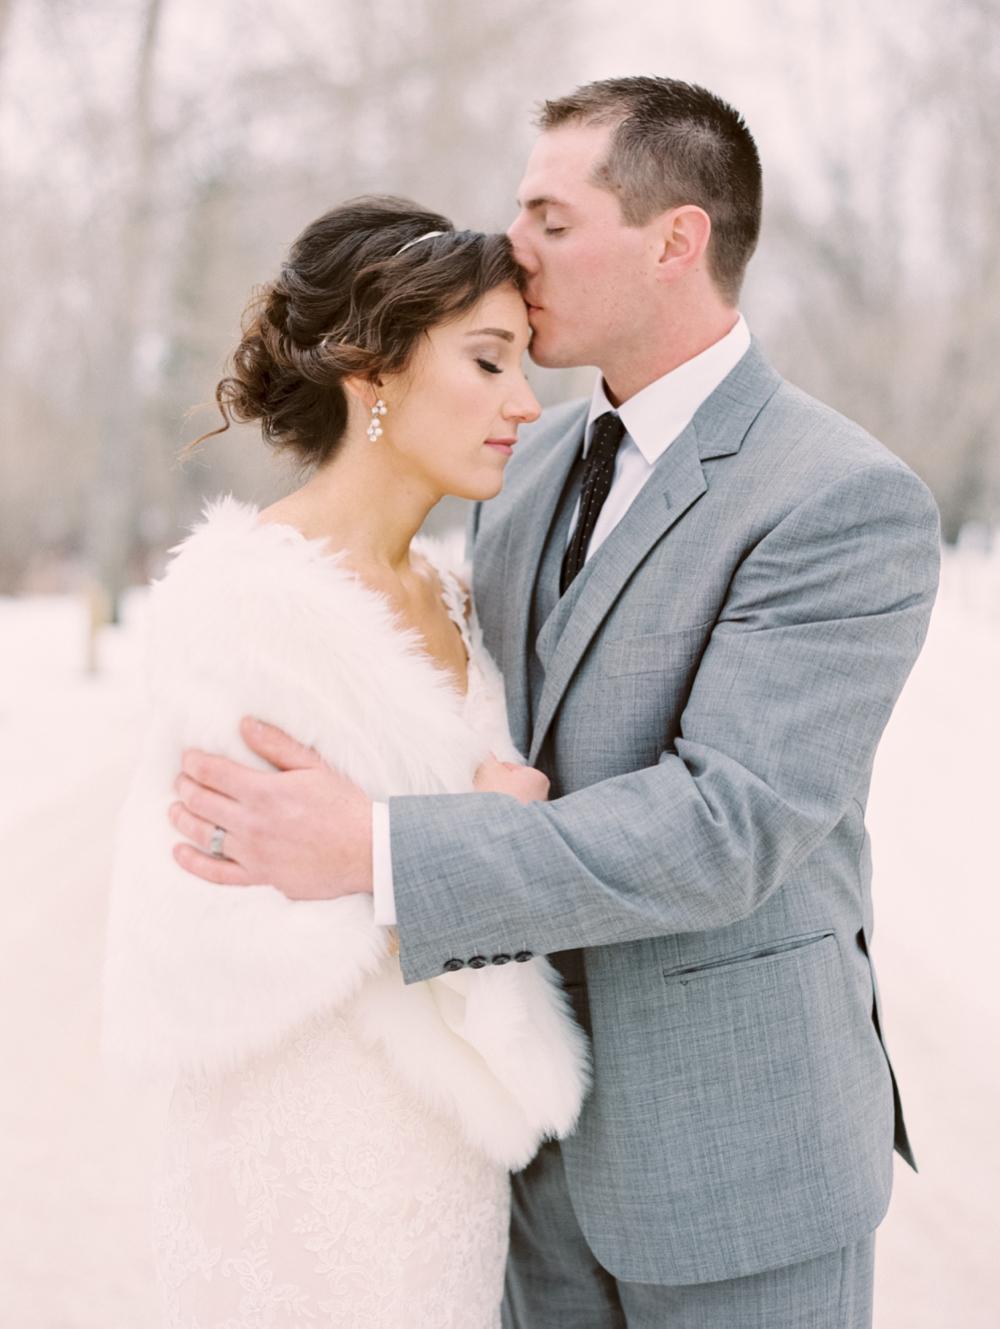 Winter wedding | Calgary wedding photographer | snowy weddings